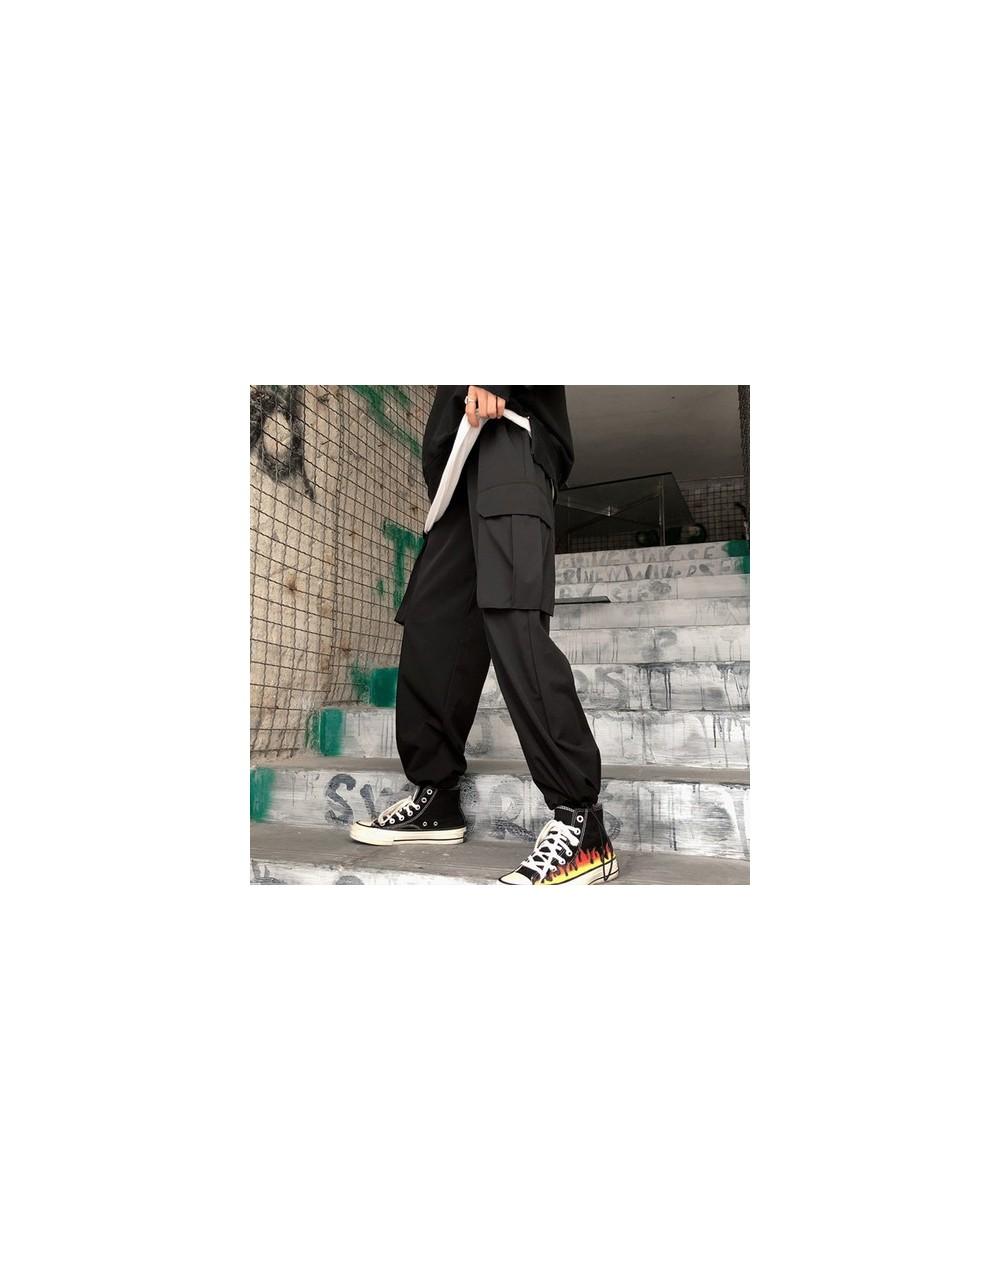 Black High Waist Wide Leg Cargo Pants Women Pockets Loose Streetwear Korean Pantalon 2019 Fashion Hip Hop Femme Trousers - b...